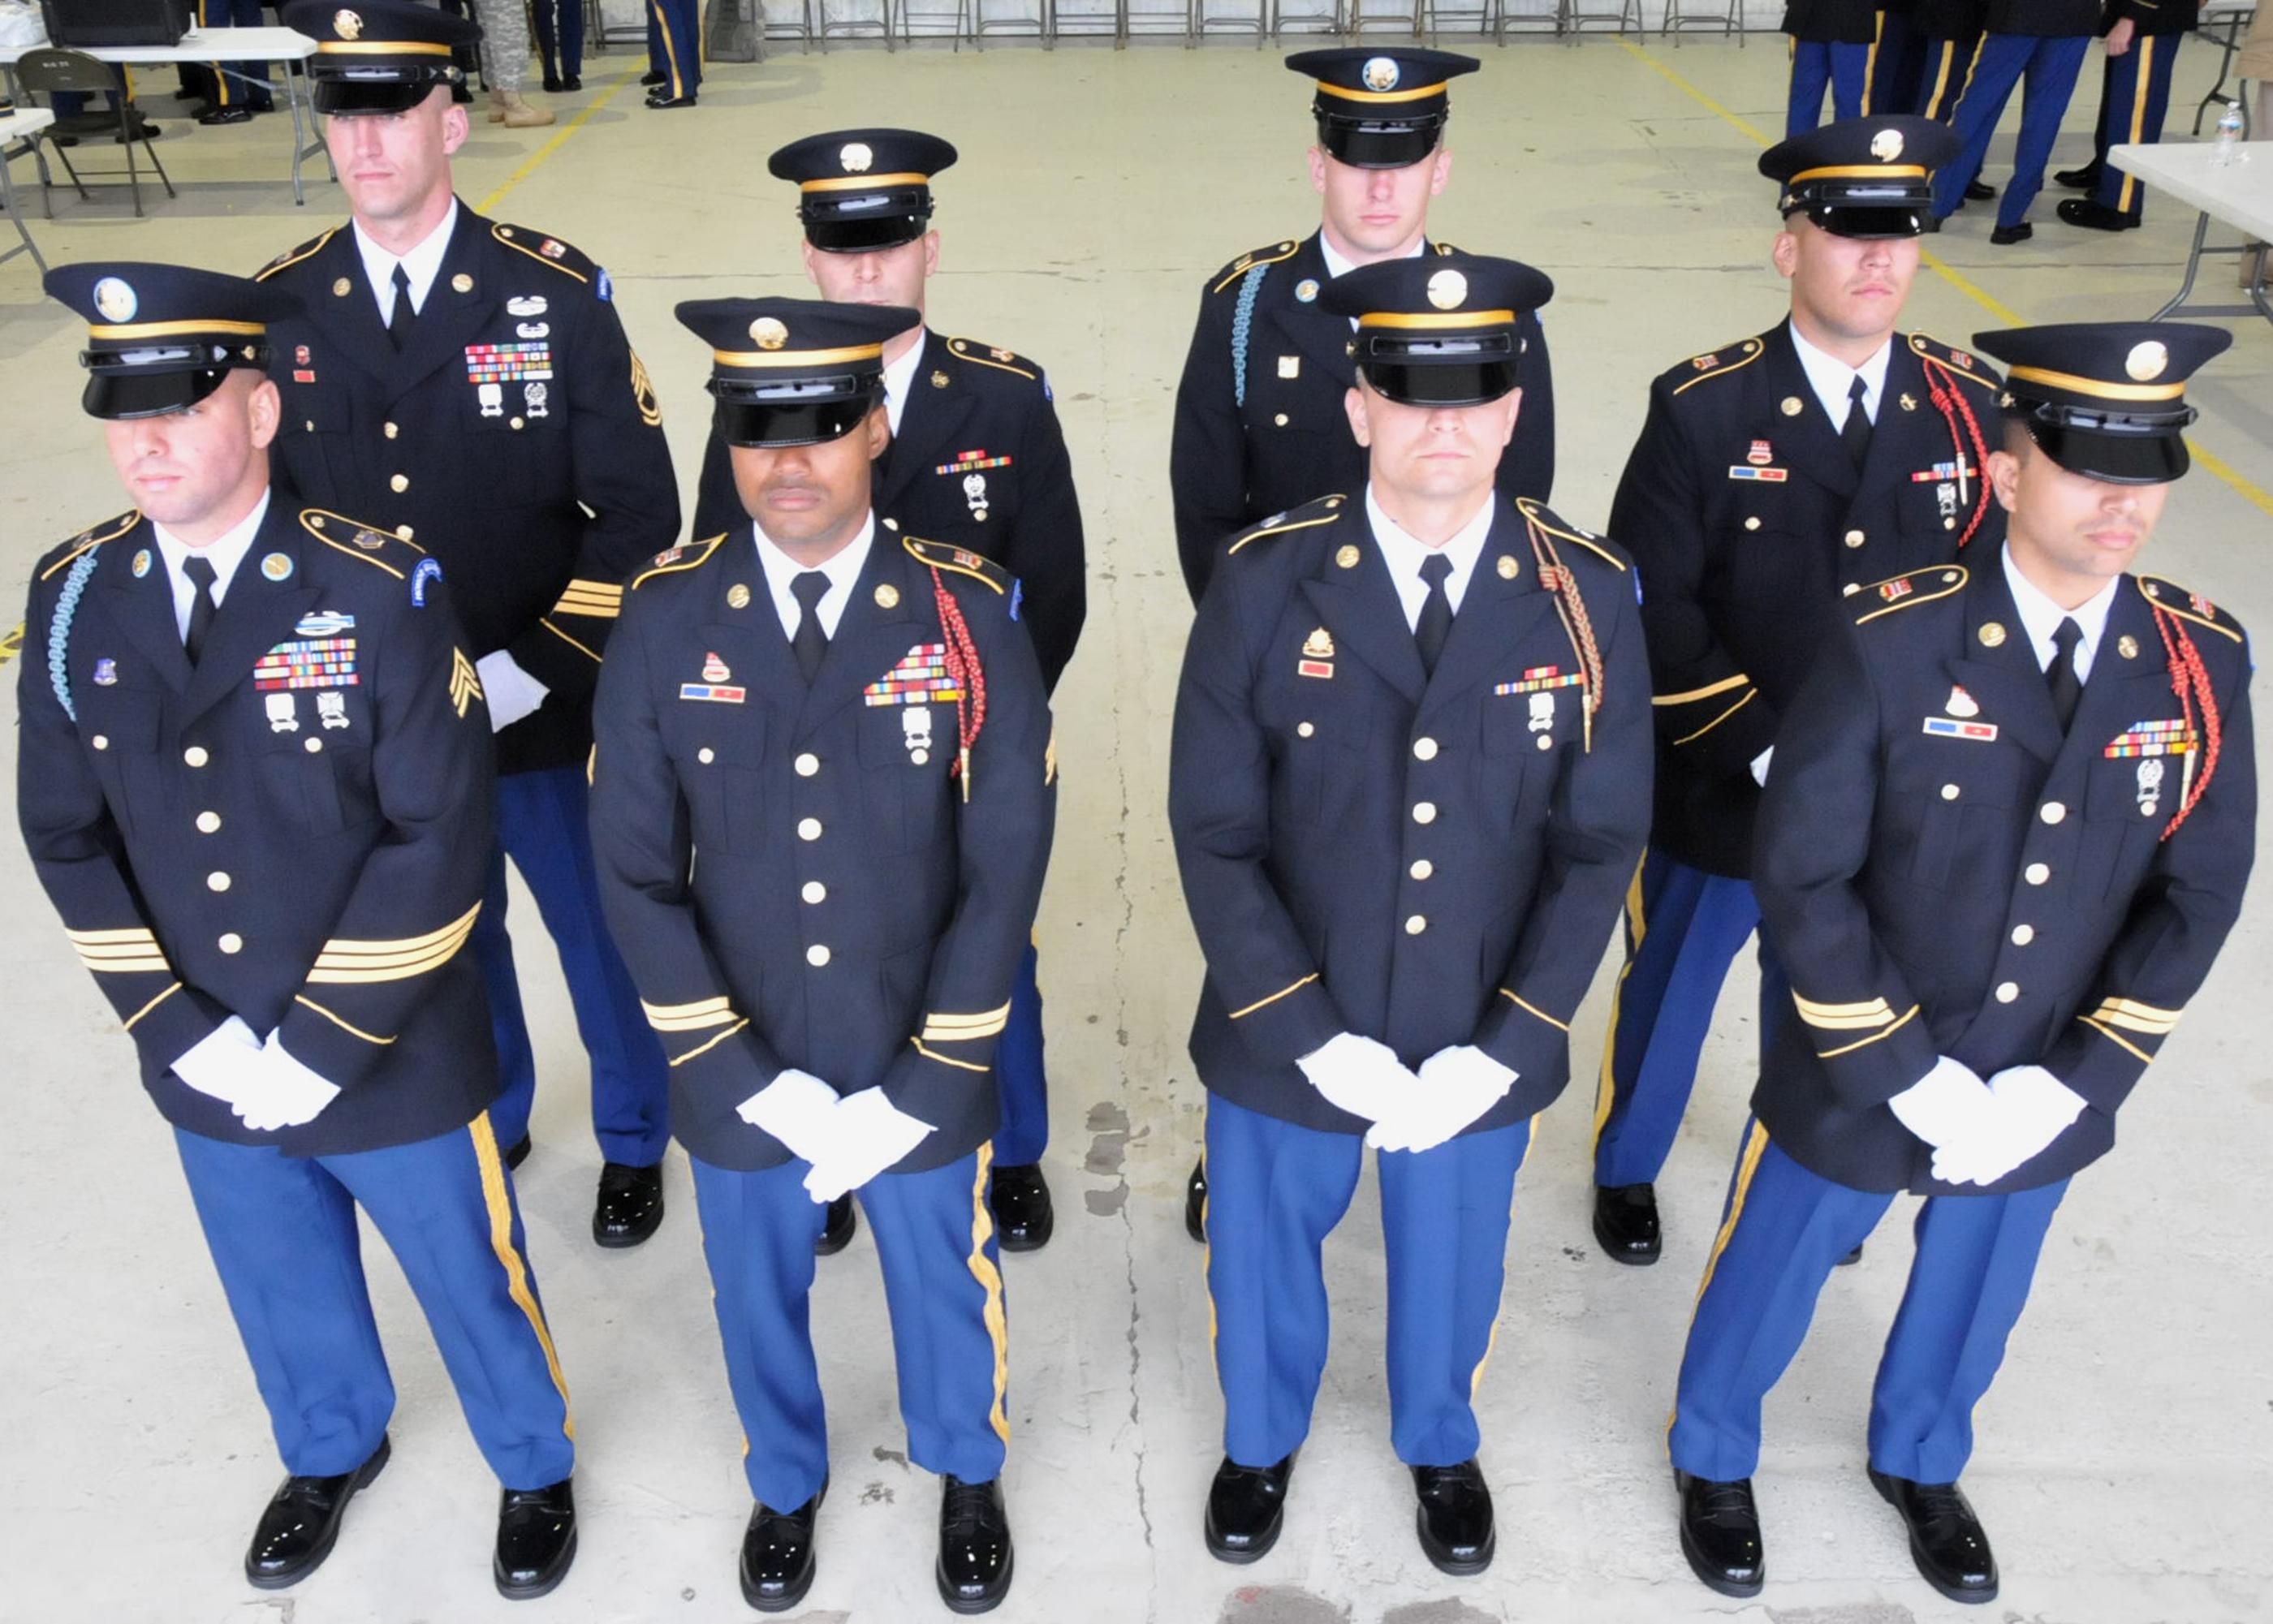 Army national guard uniform